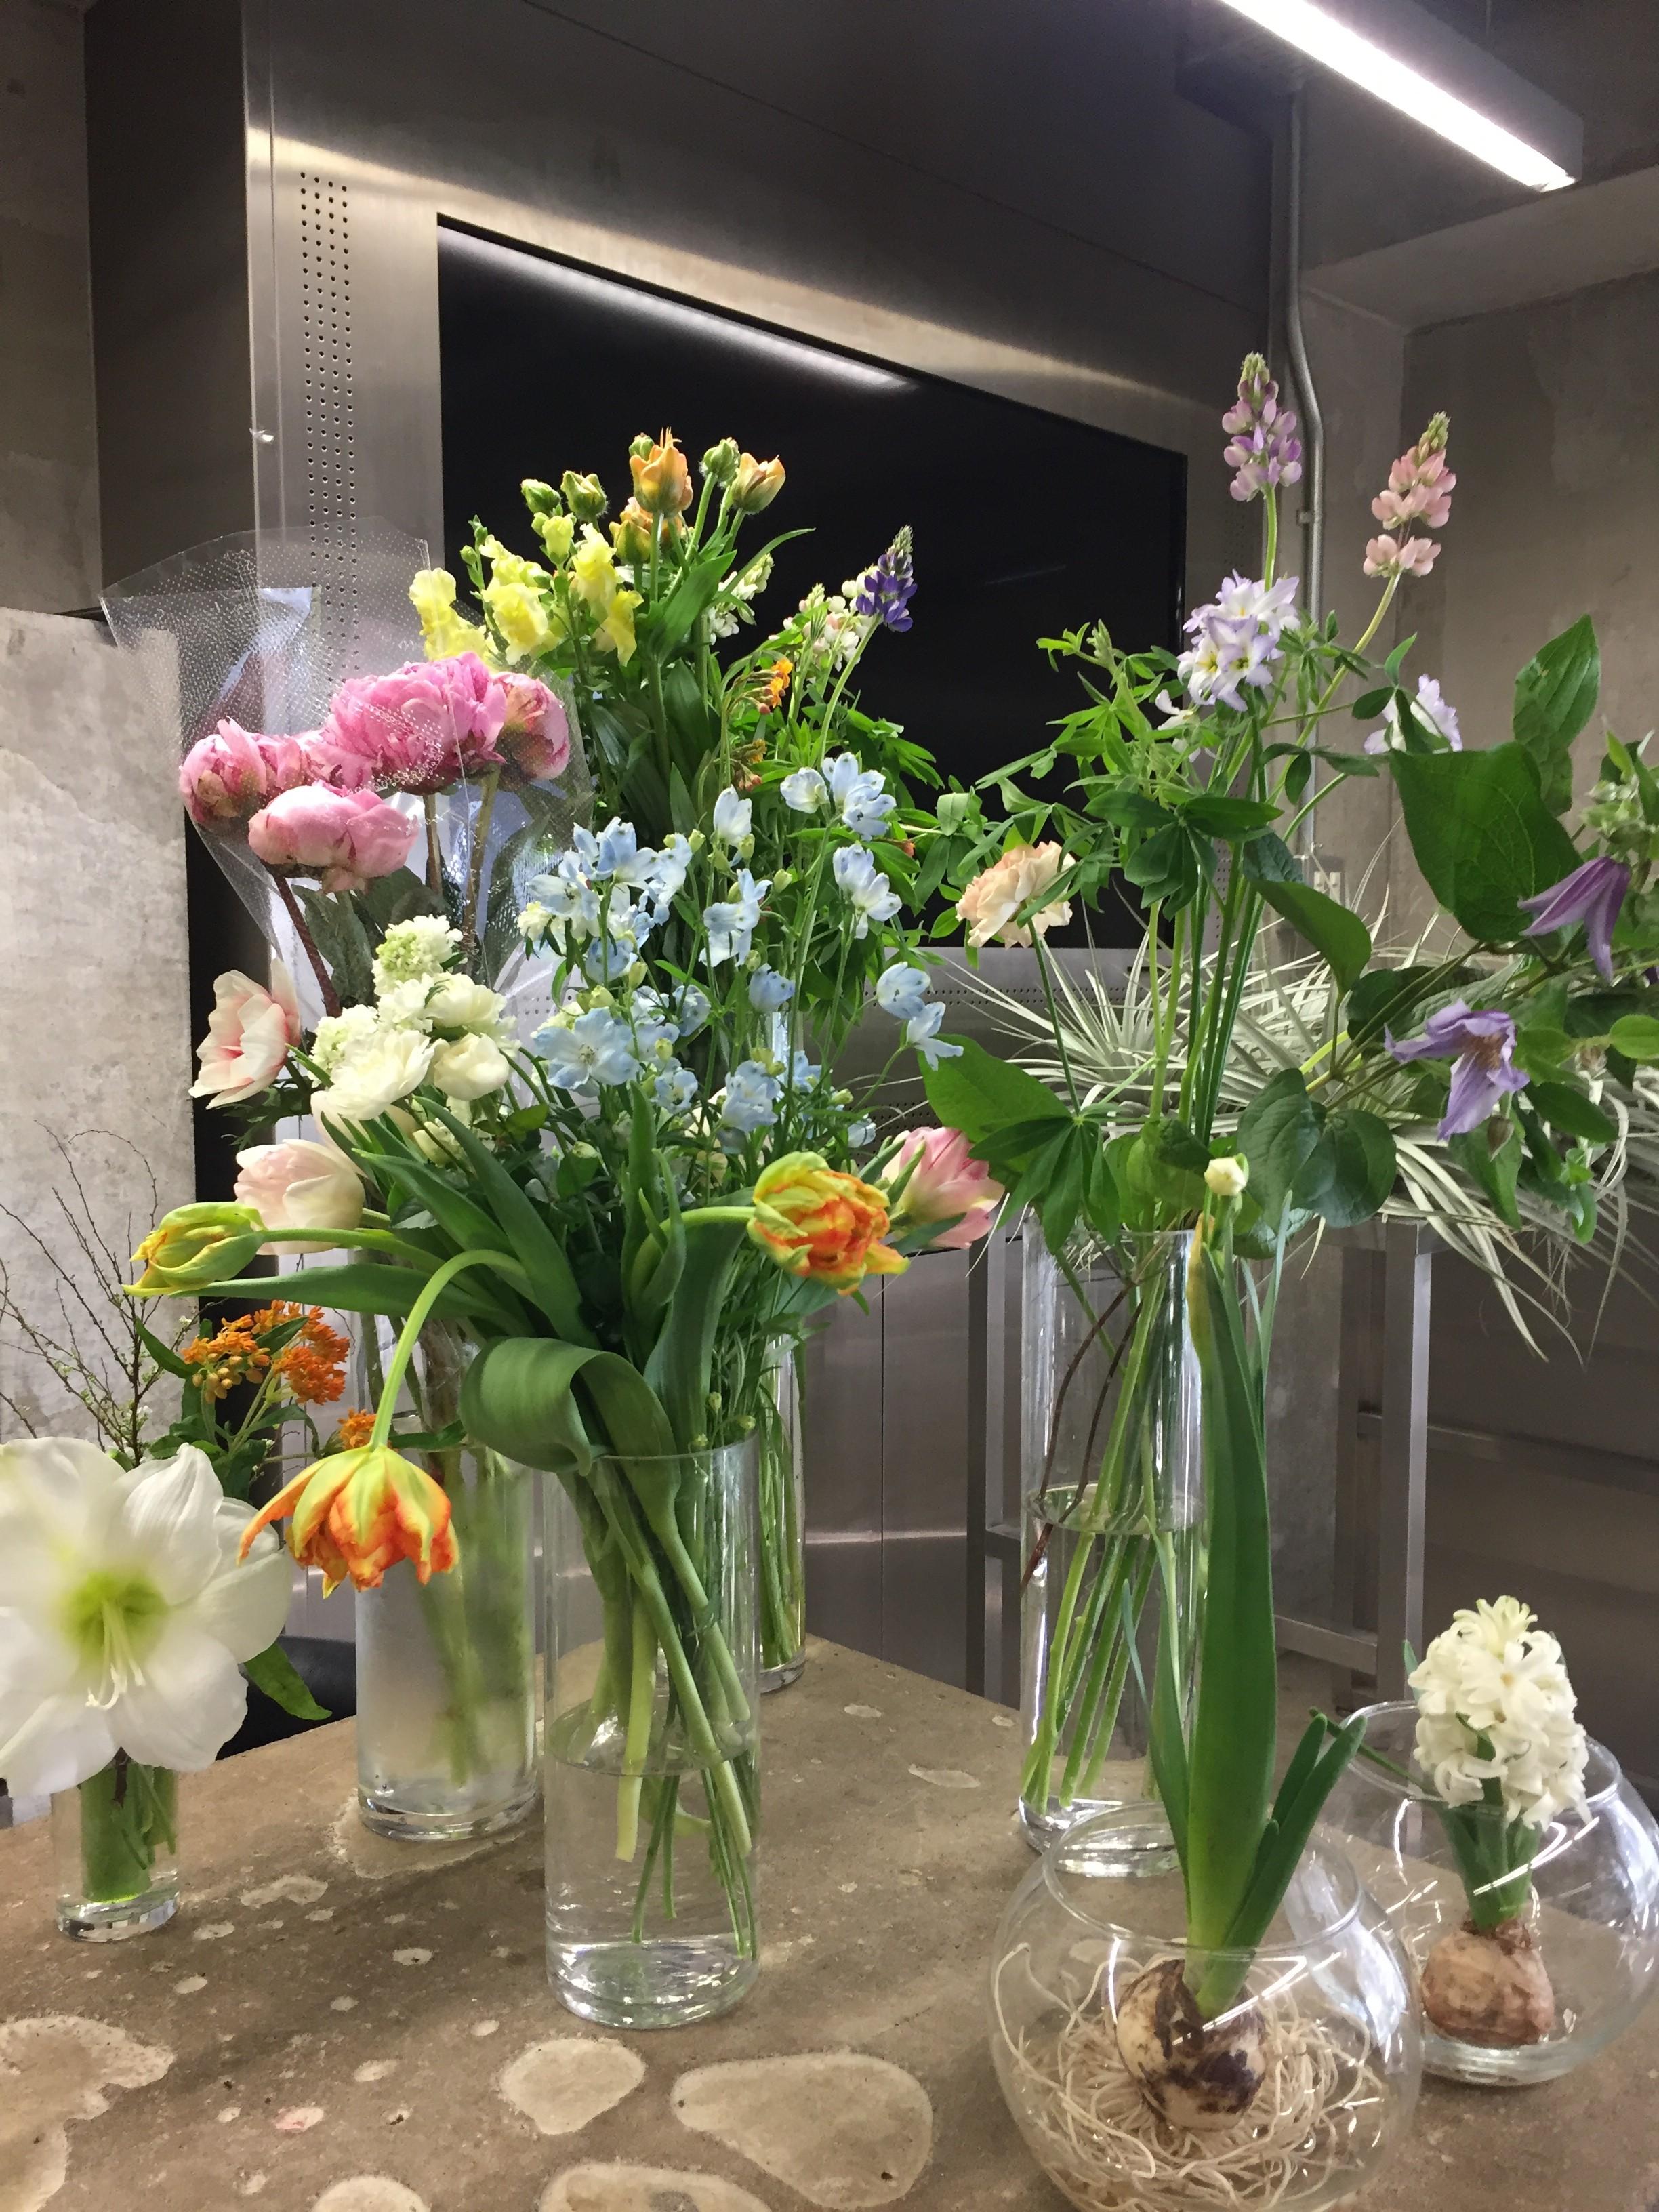 azuma makoto, amkk, JARDINS des FLEURS, botanical sculpture, flower art